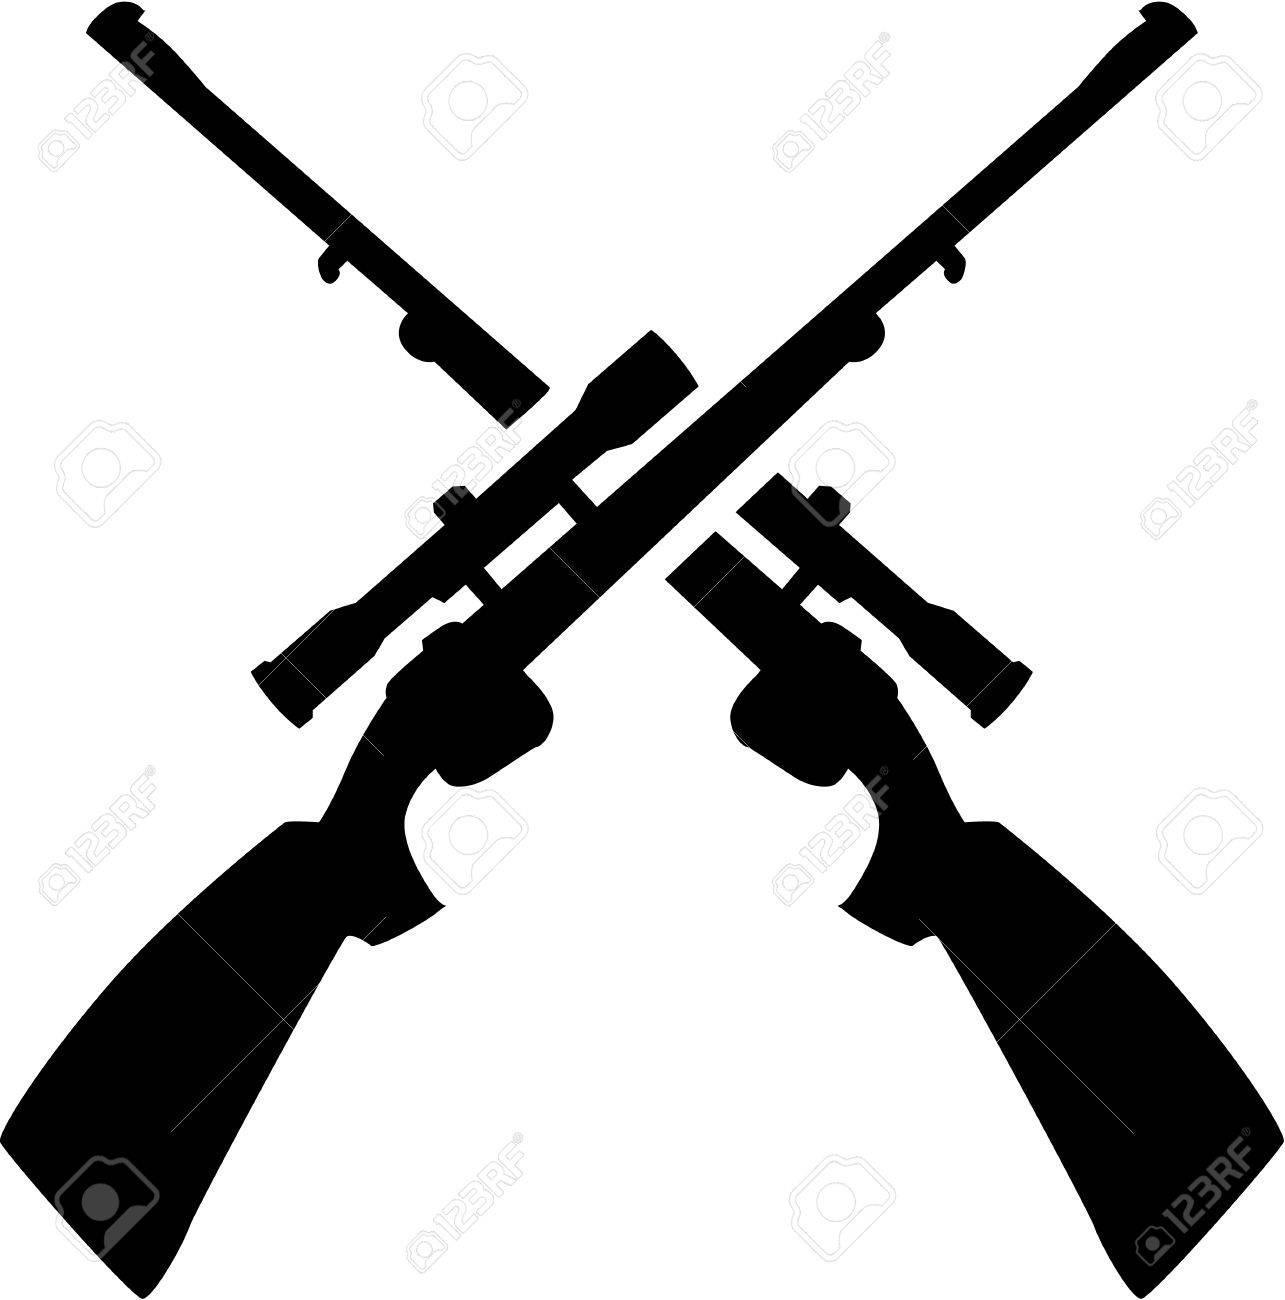 1227 Rifle free clipart.